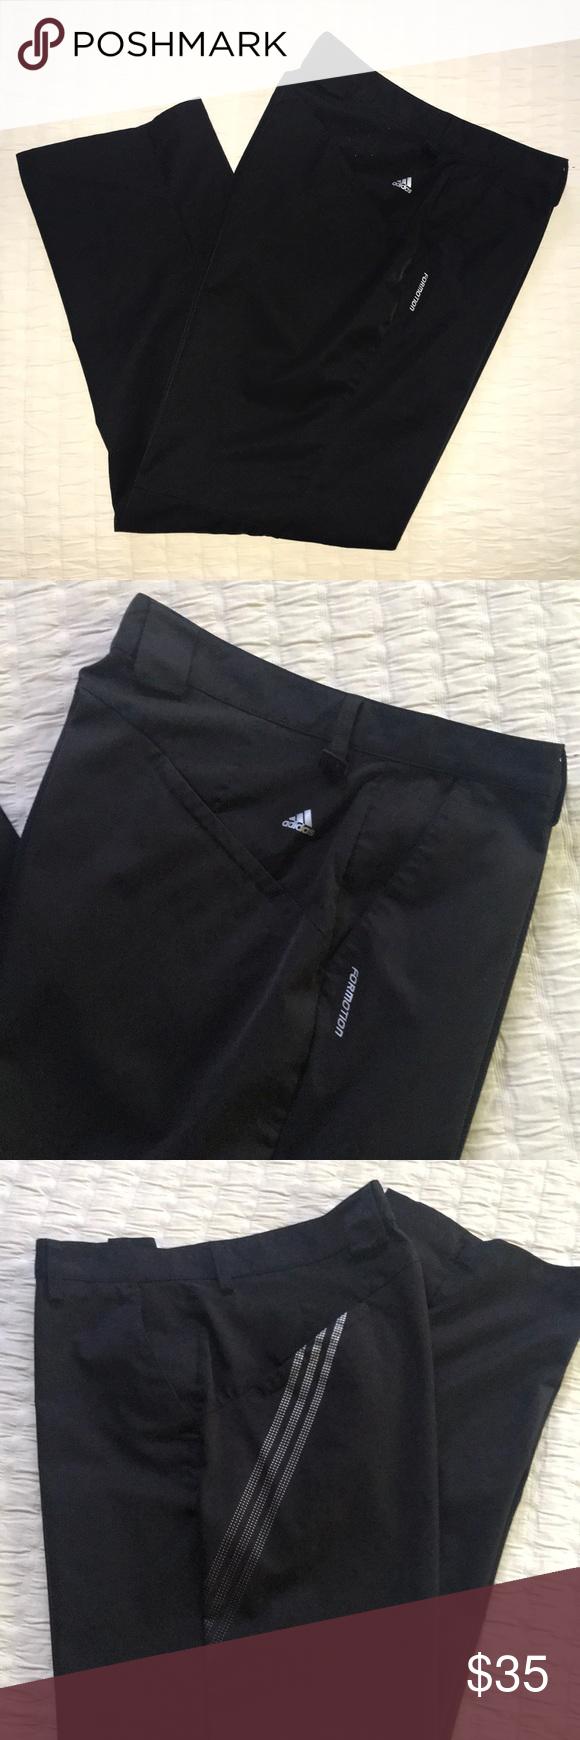 Adidas ClimaCool Formotion Golf Pants 36x32   Golf pants, Clothes ...